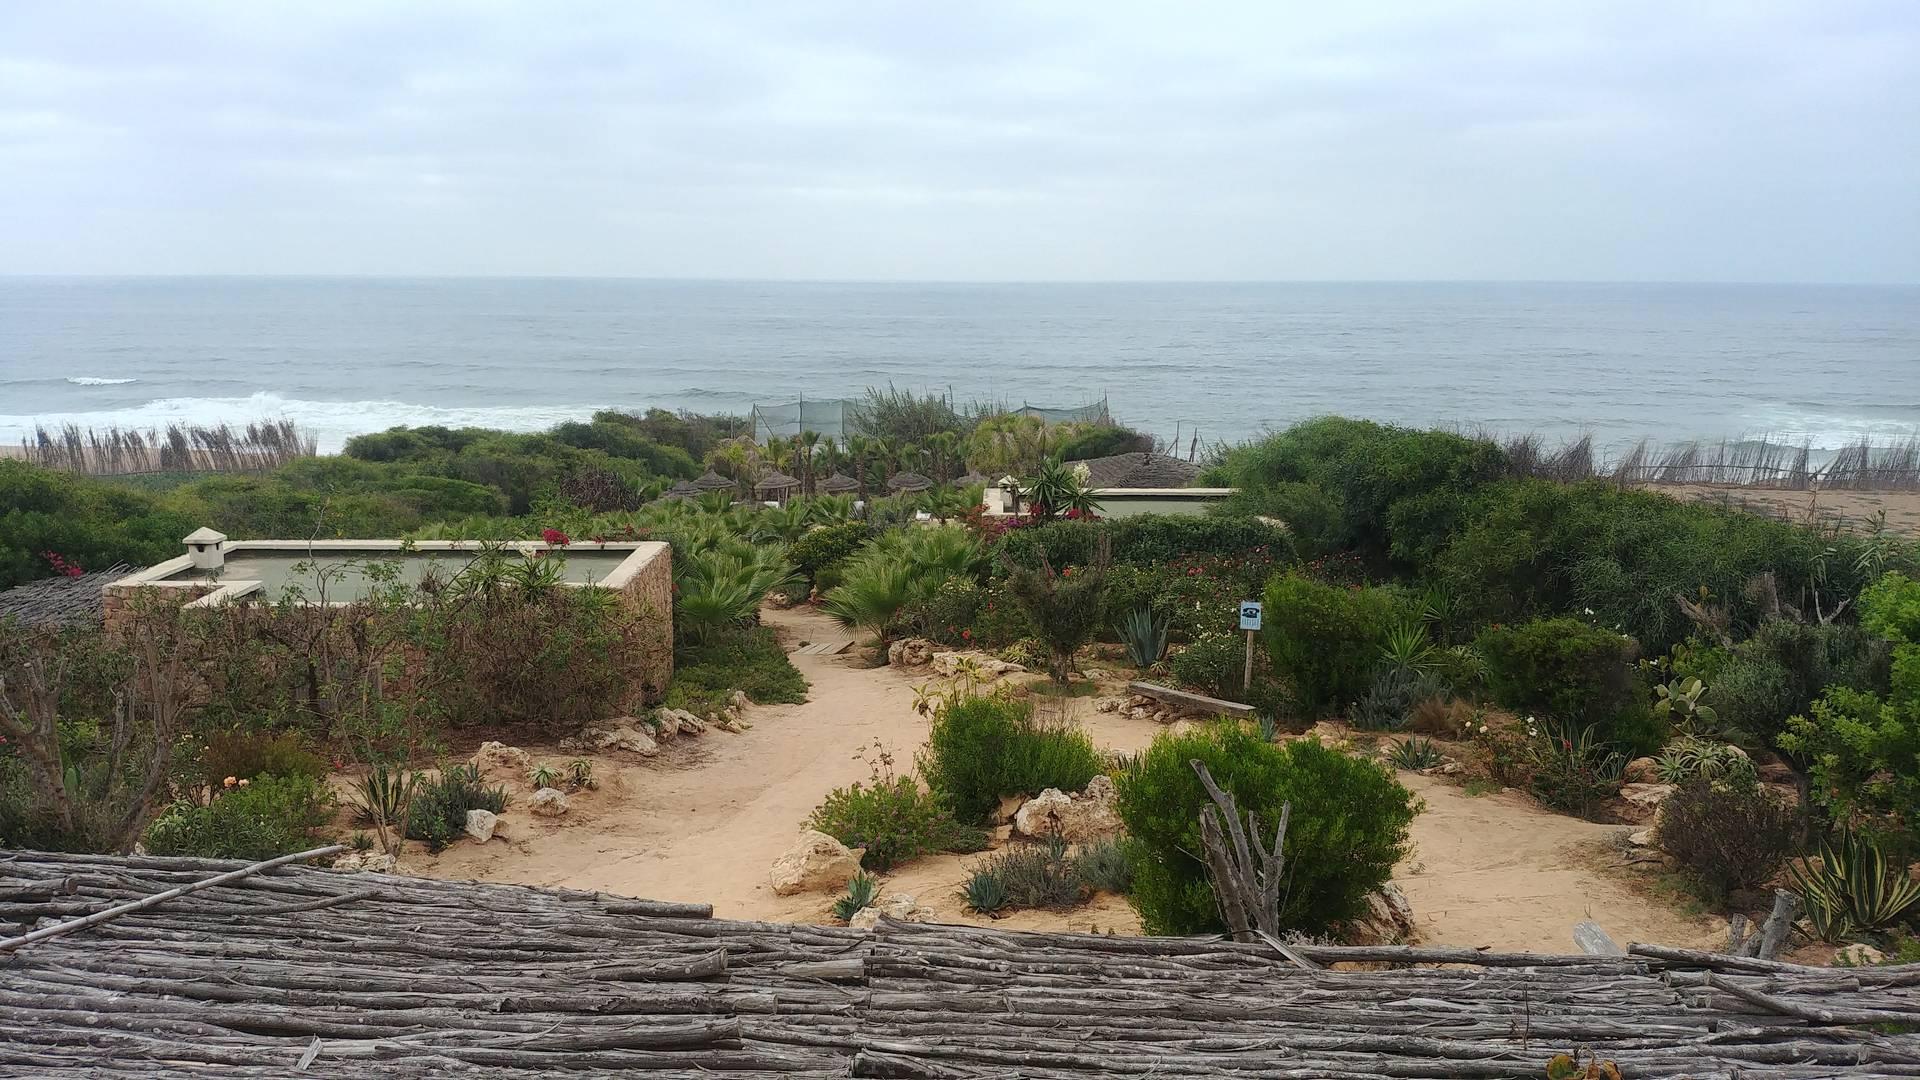 Maroc - Jardin de l'Azalai Beach Cottage